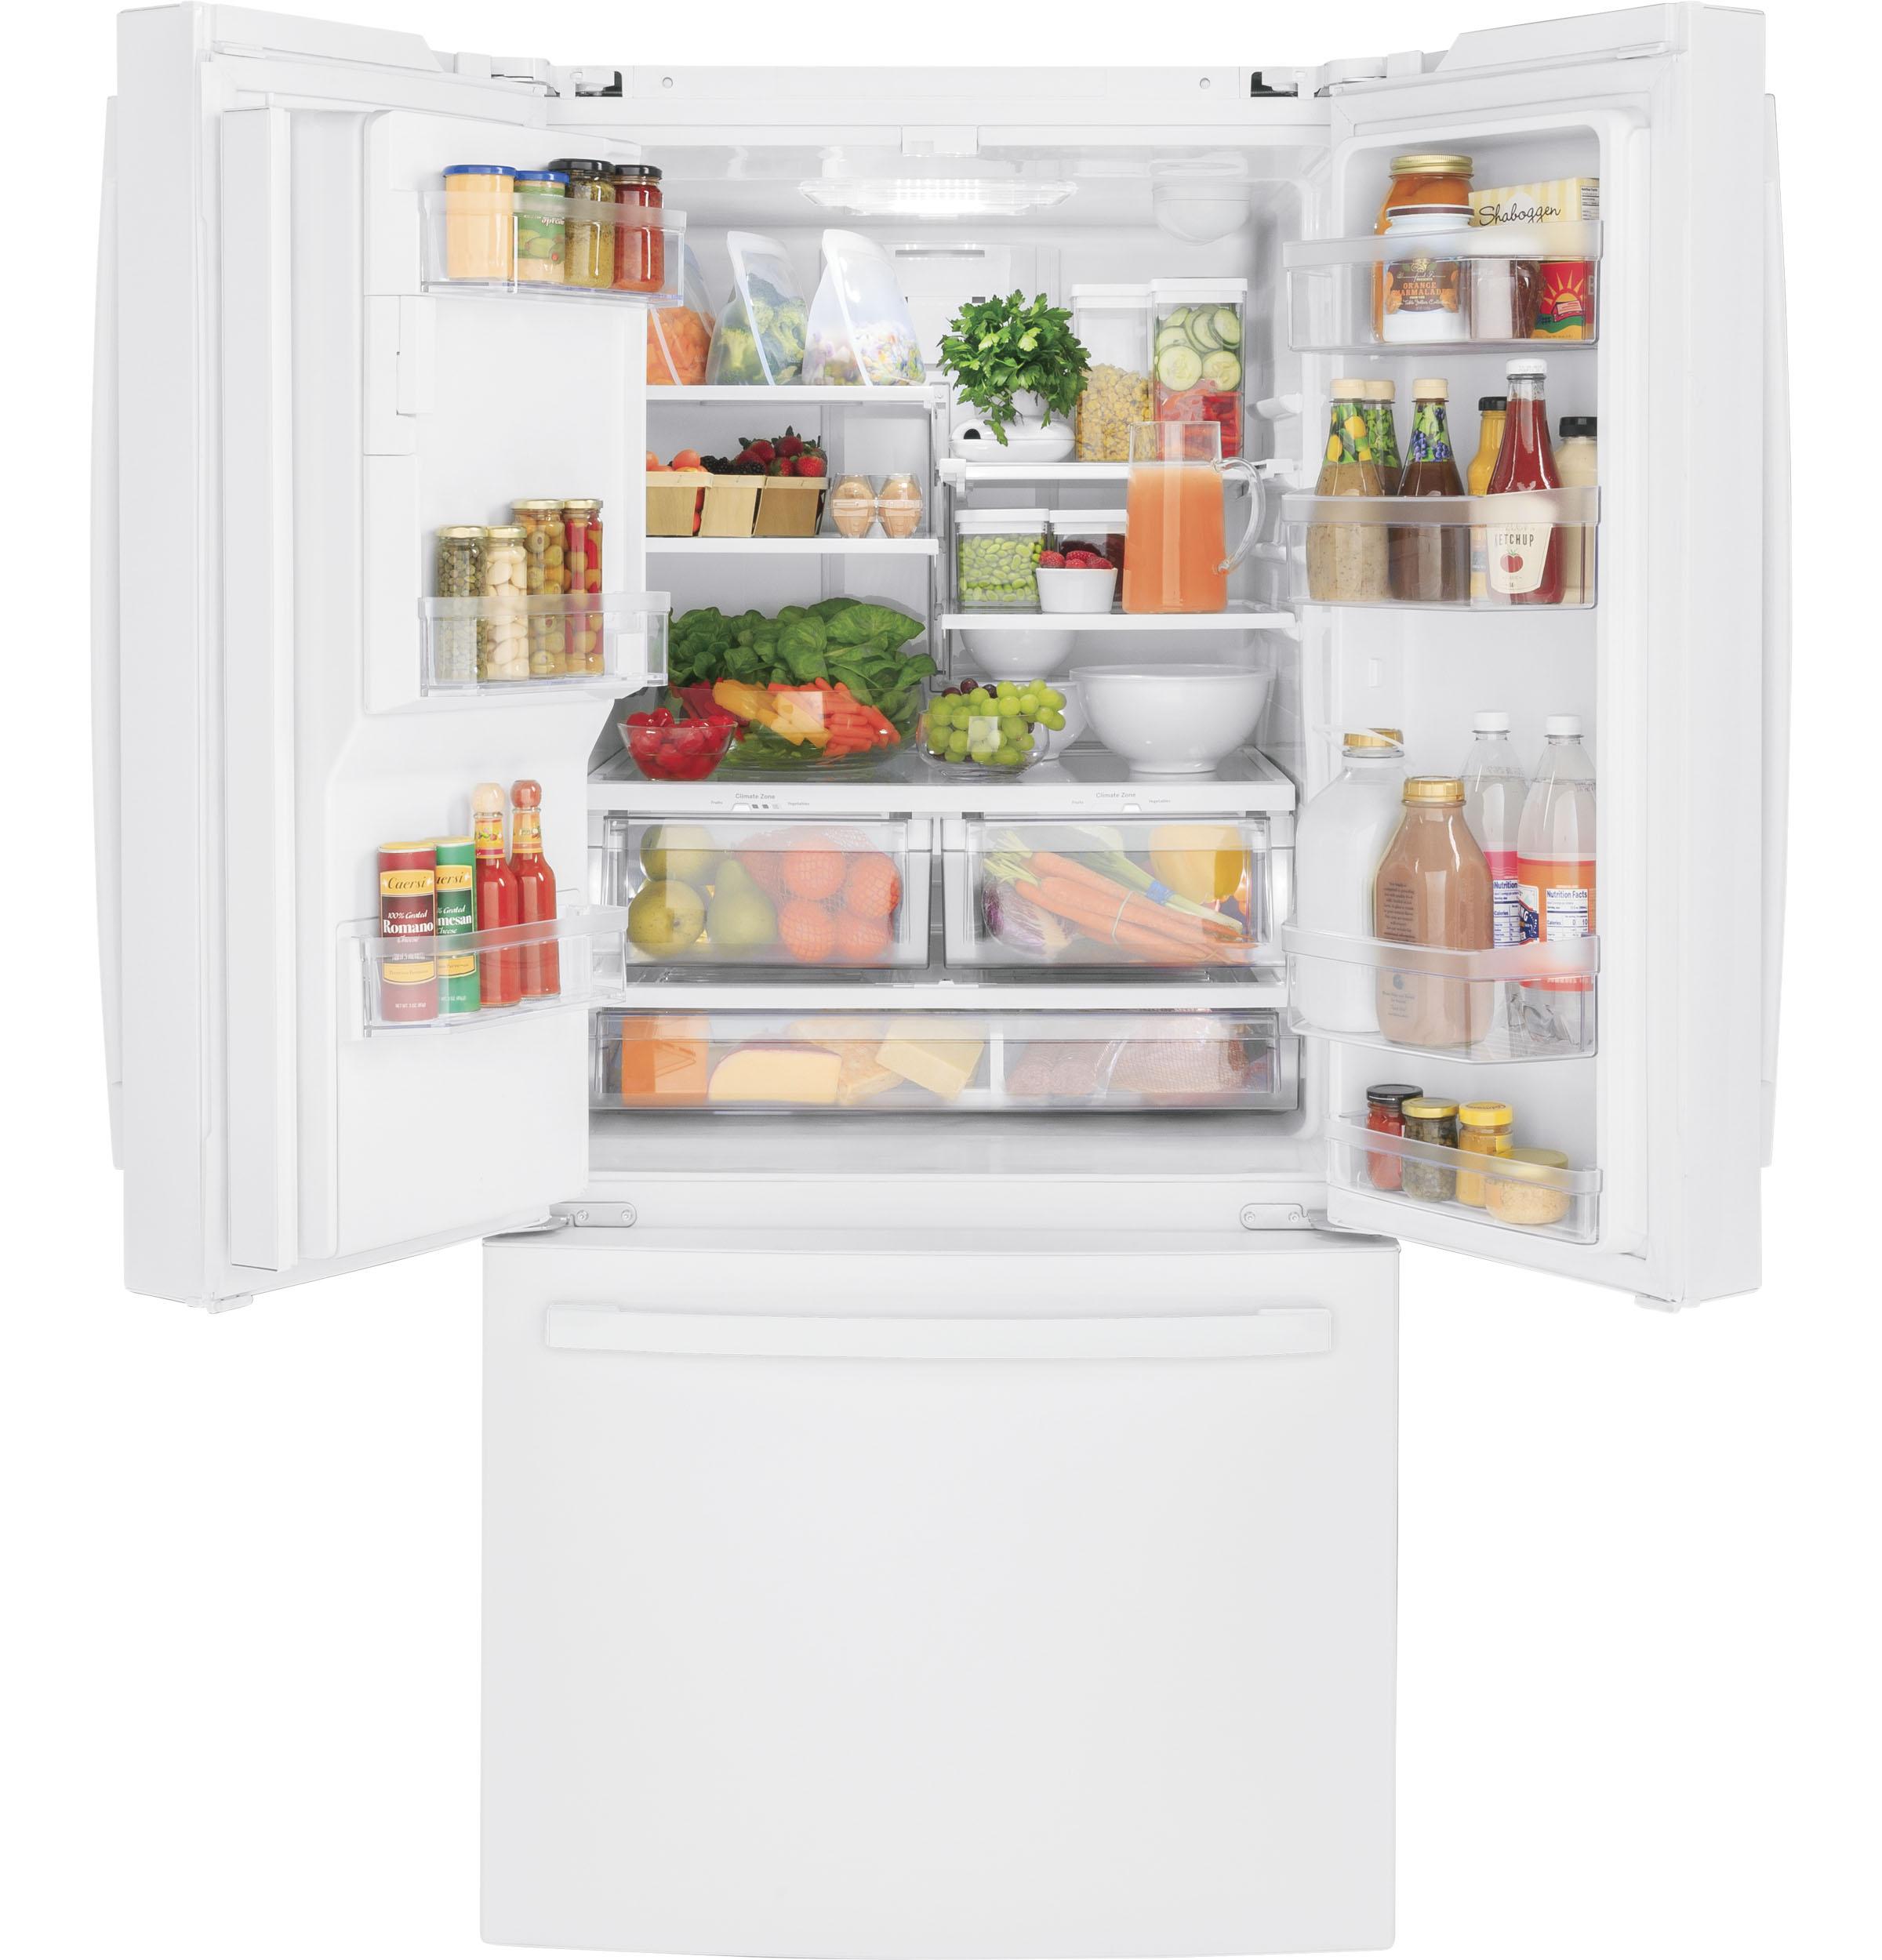 Model: GFE24JGKWW   GE GE® ENERGY STAR® 23.7 Cu. Ft. French-Door Refrigerator